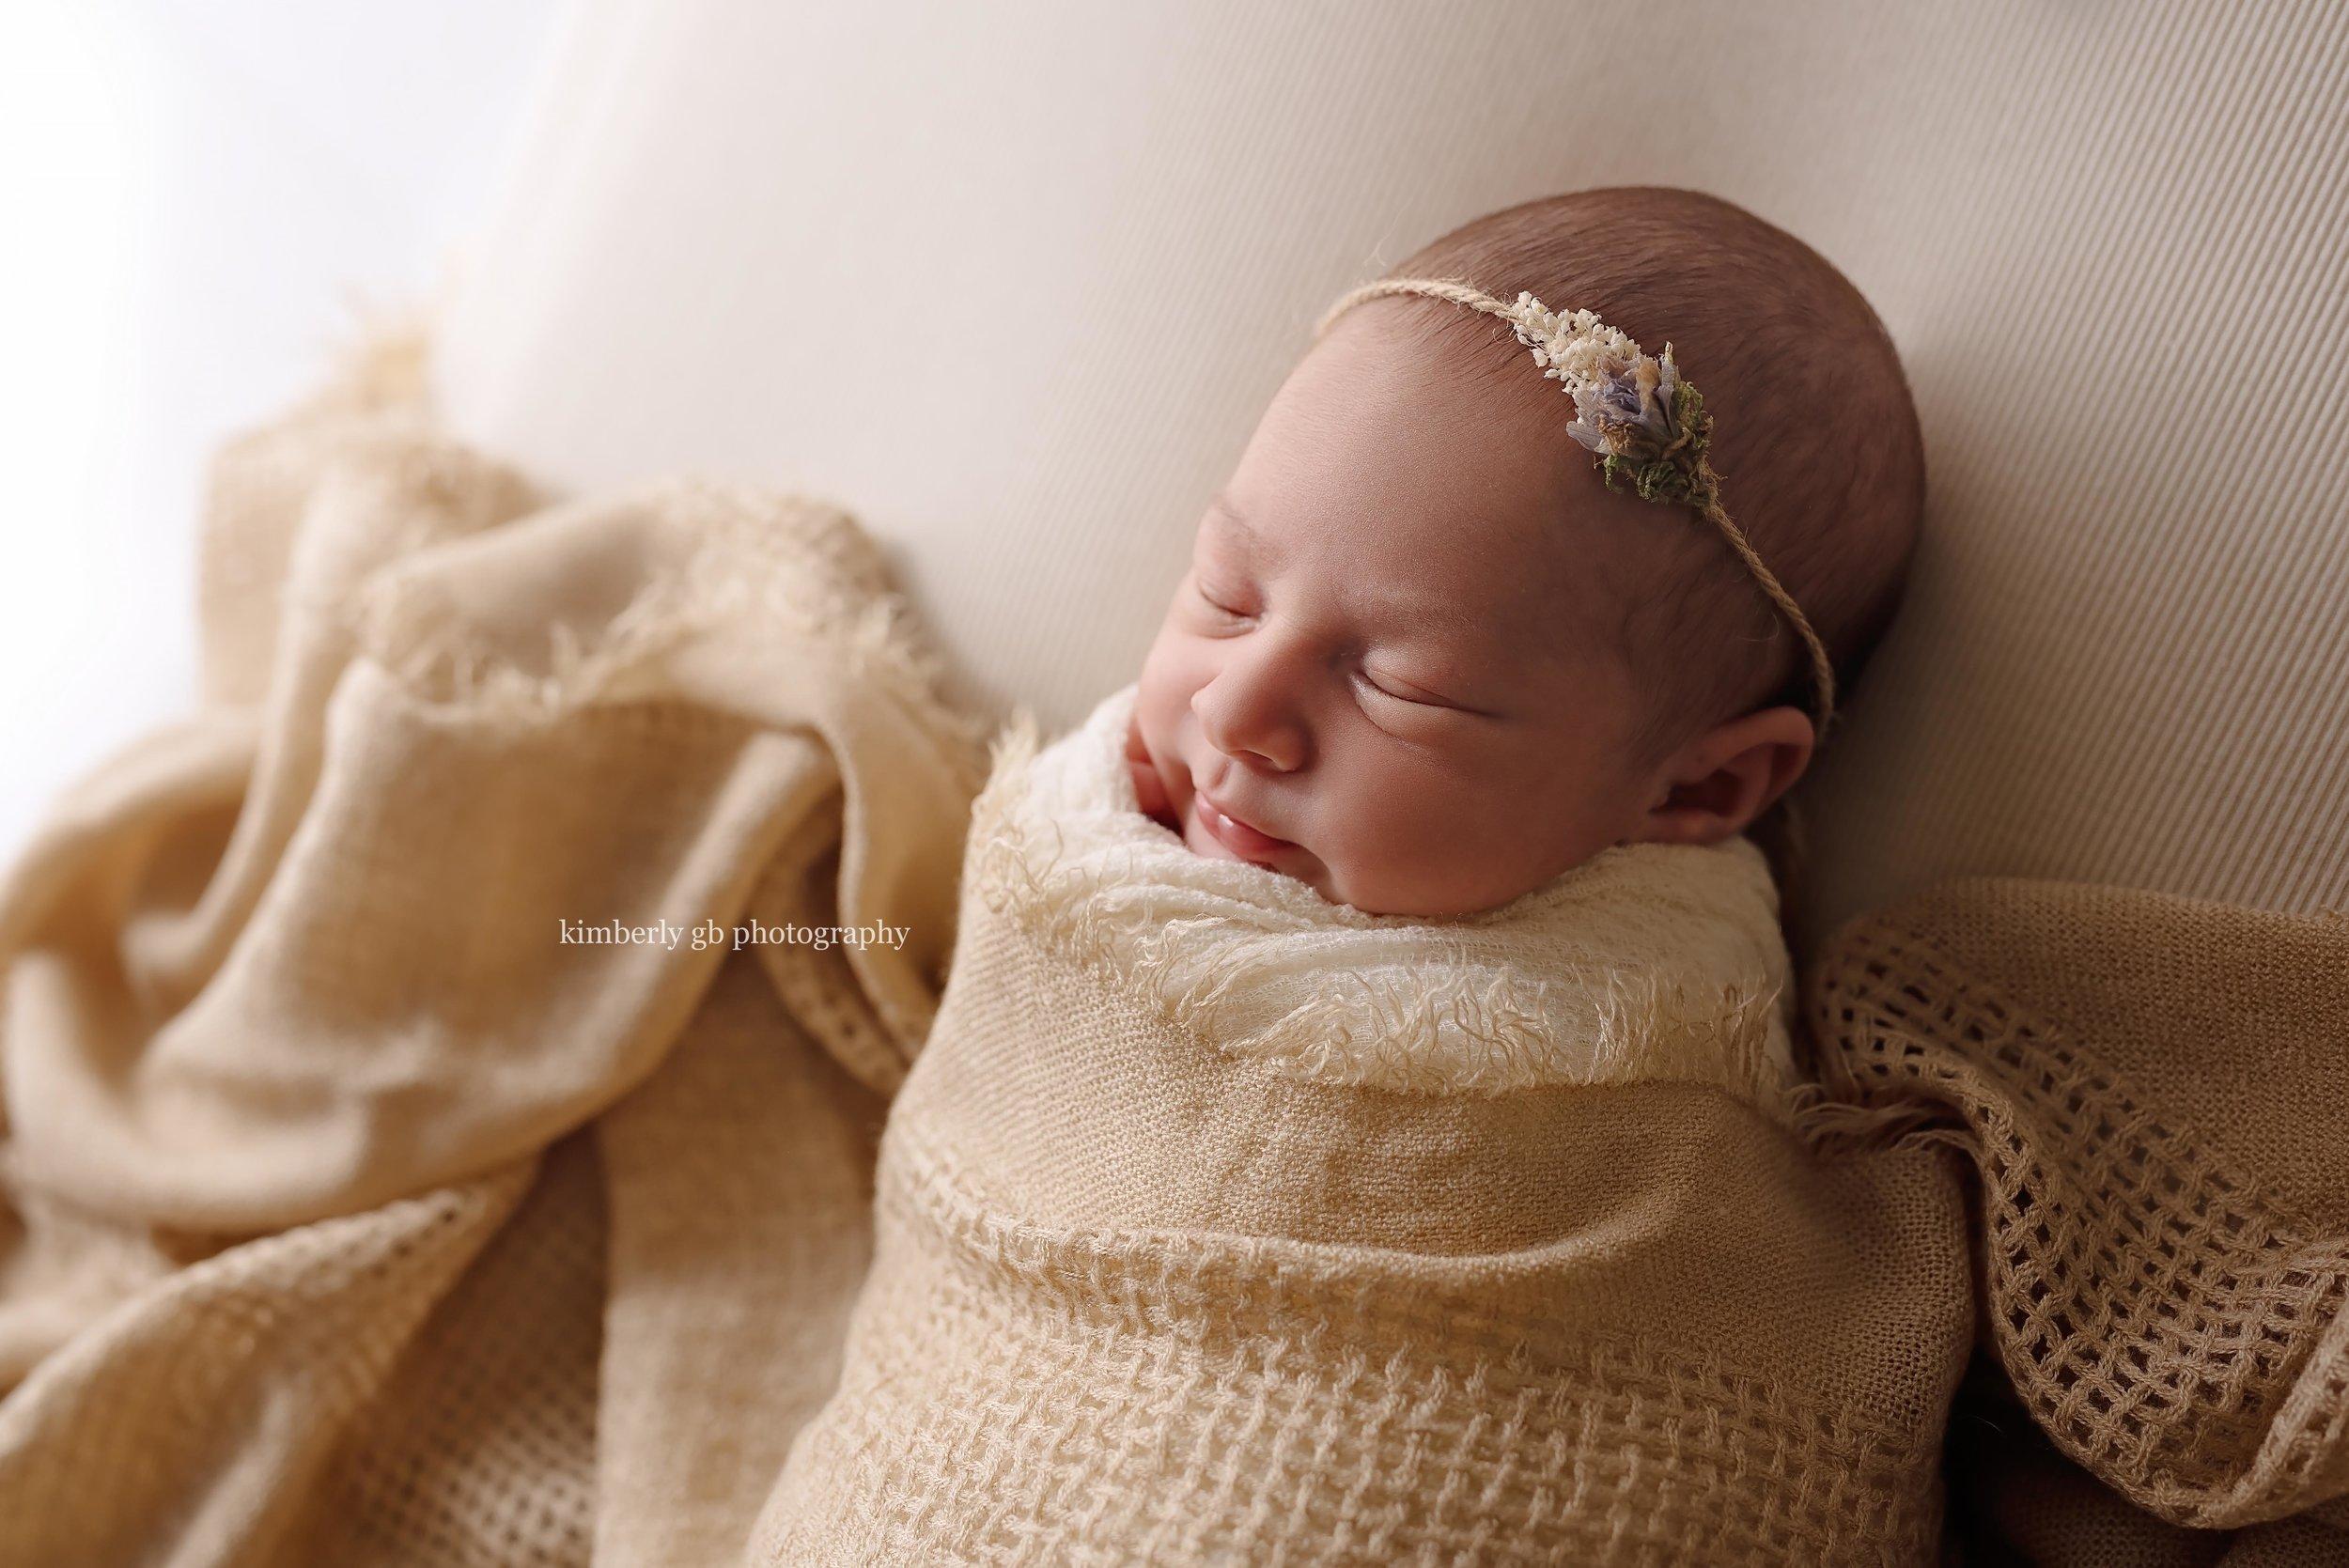 fotografia-de-recien-nacidos-bebes-newborn-en-puerto-rico-kimberly-gb-photography-fotografa-303.jpg